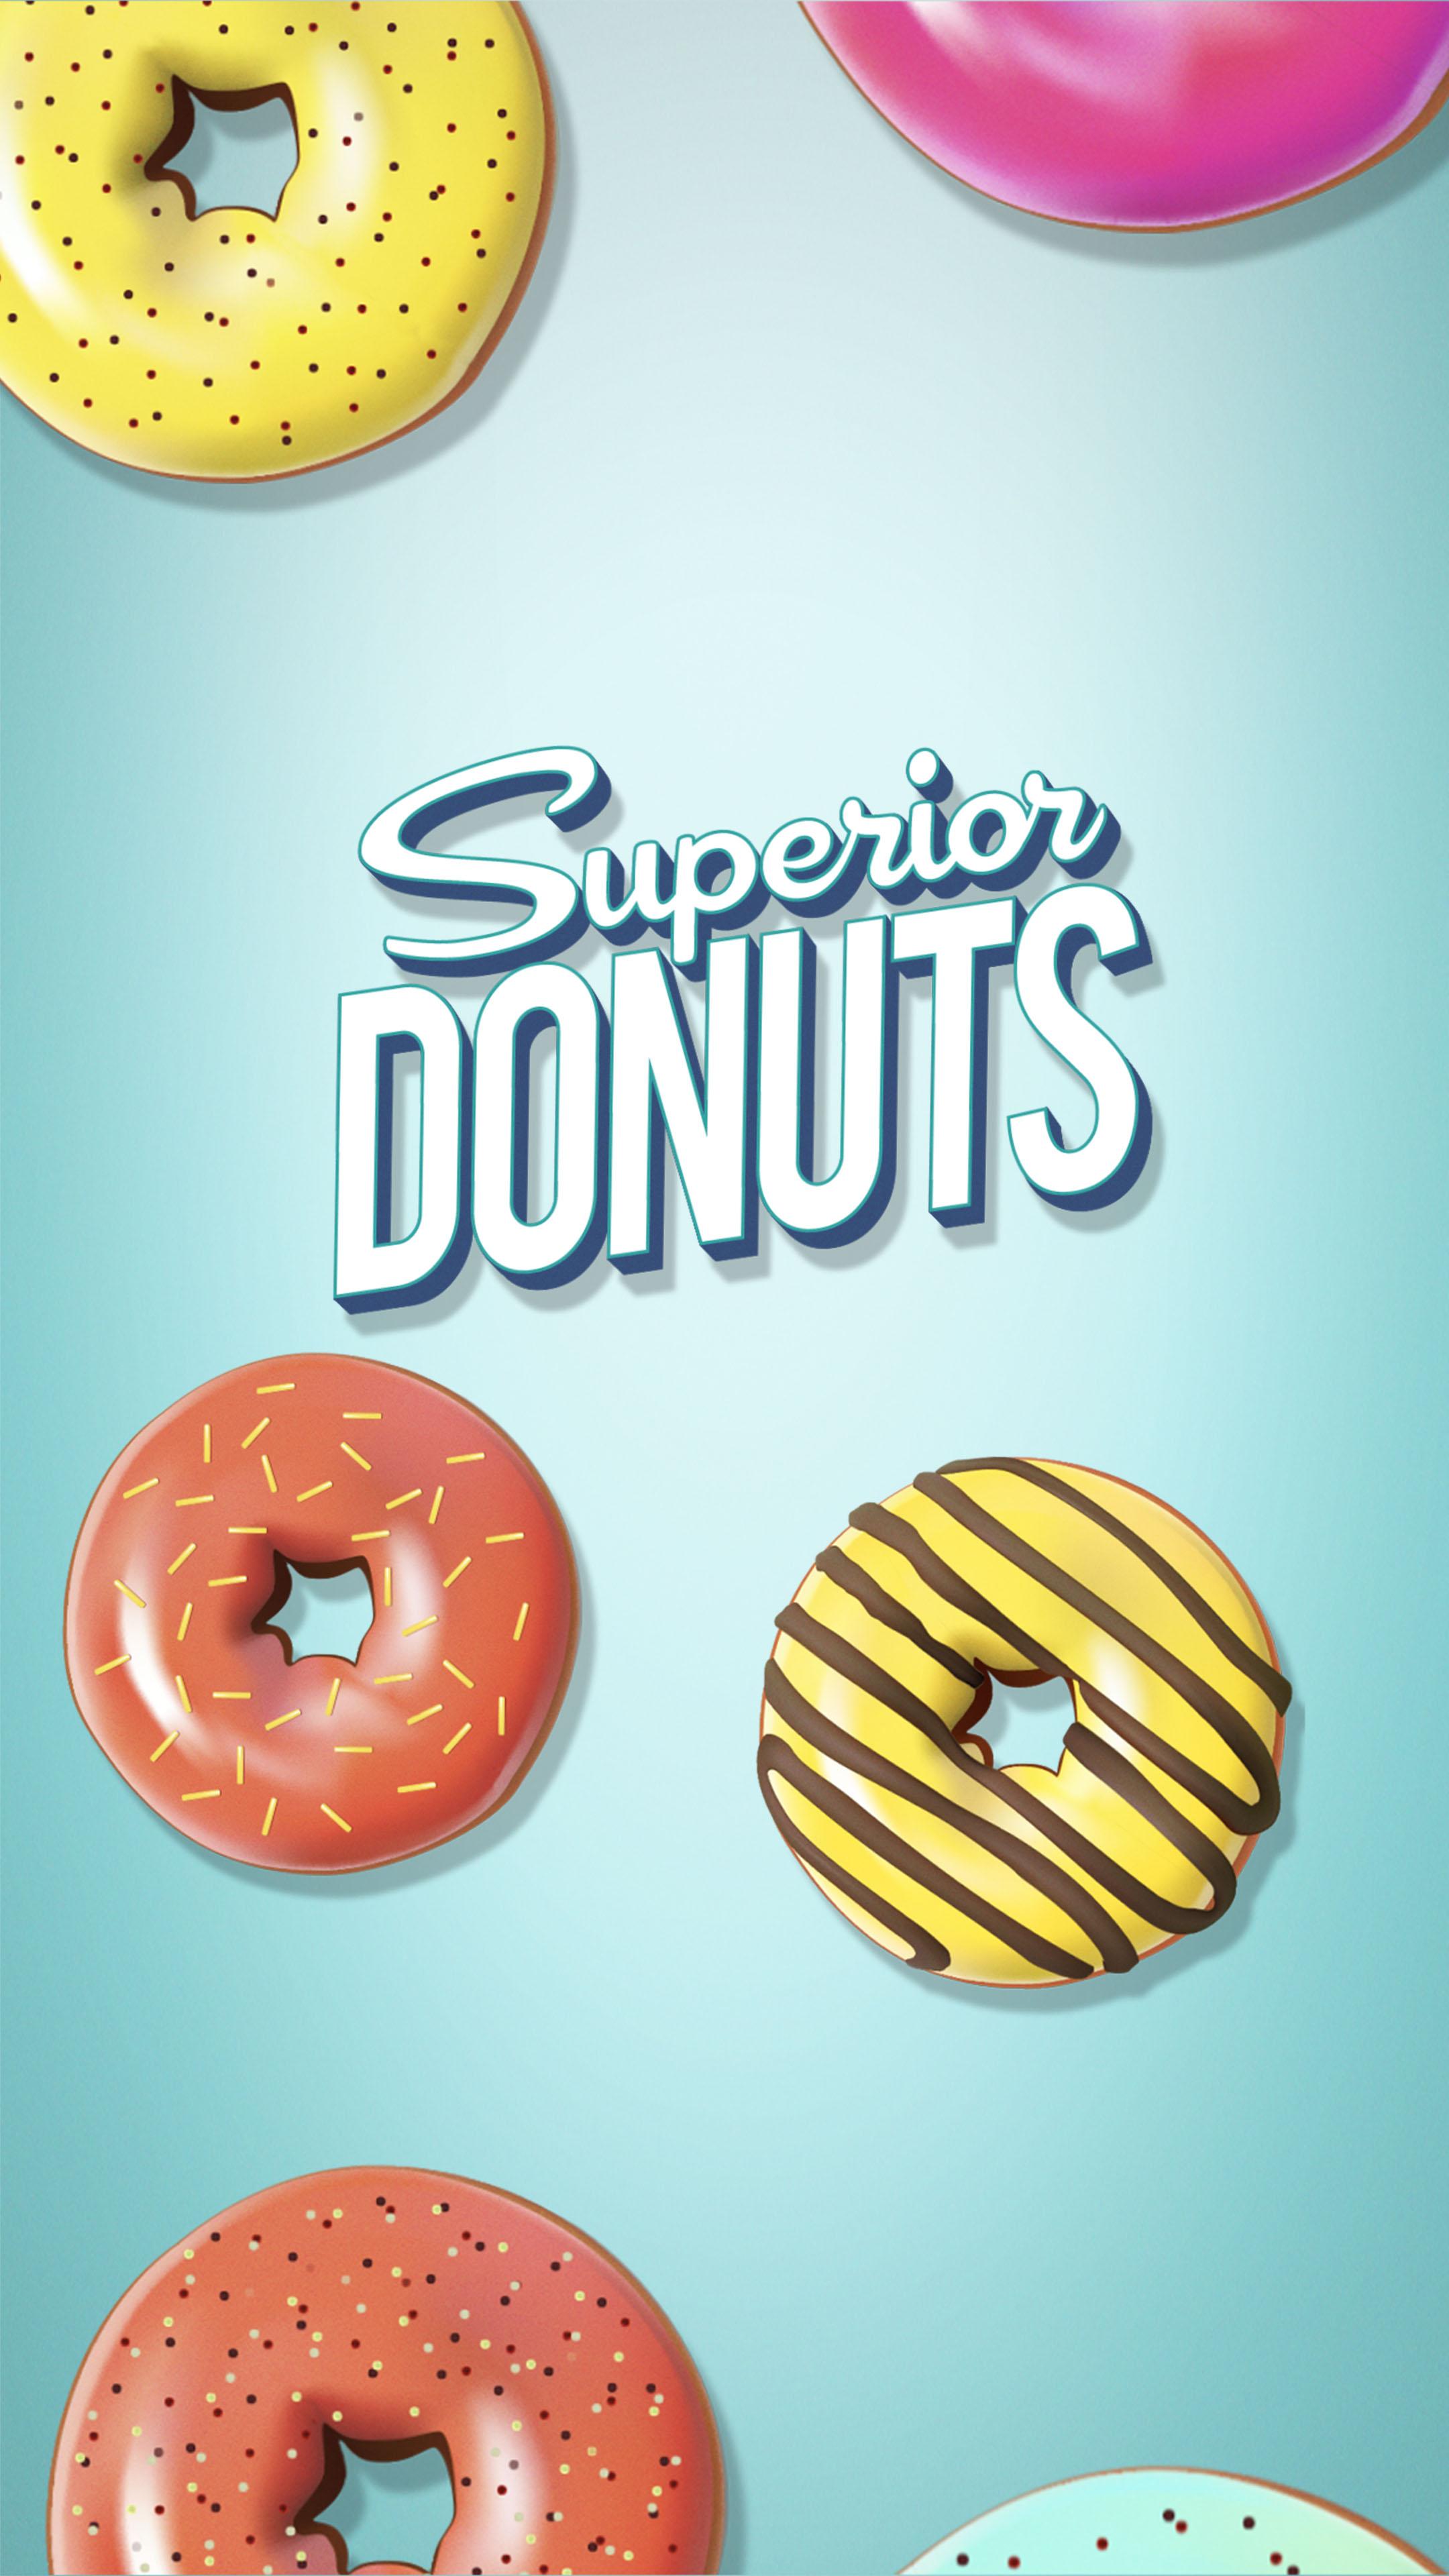 Superior Donuts (2017)